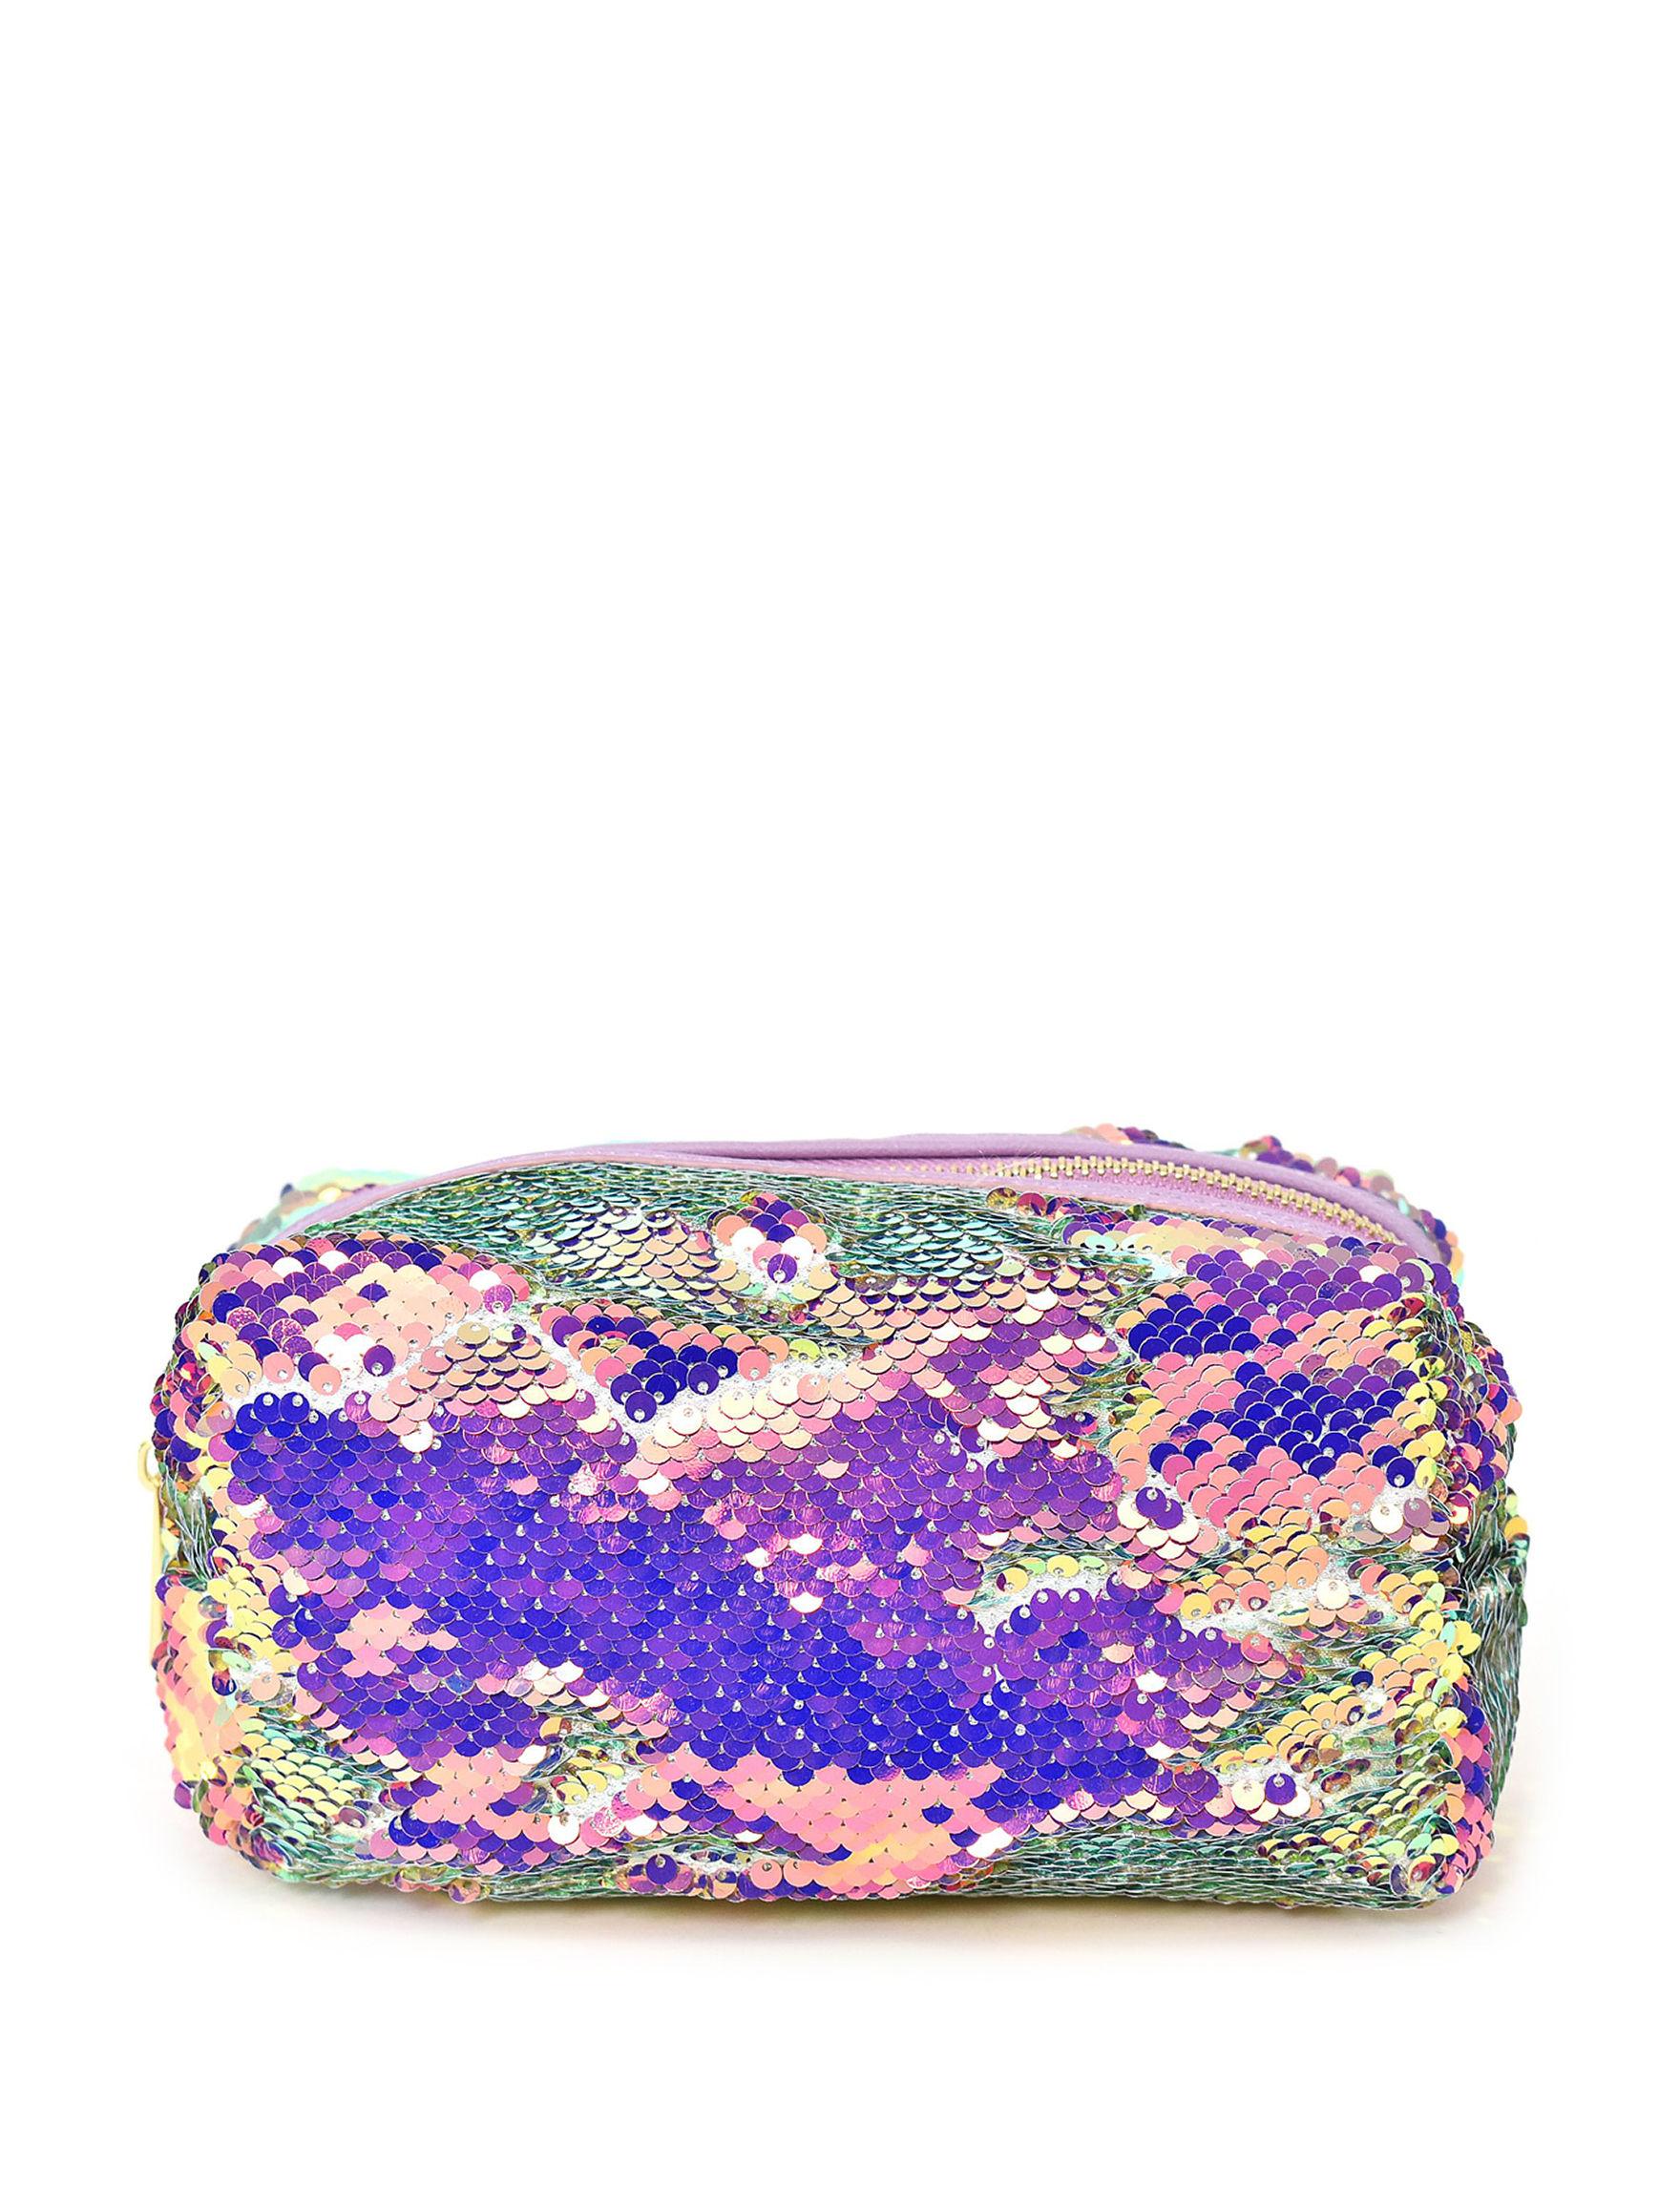 Imoshion Purple Sequin Pouch